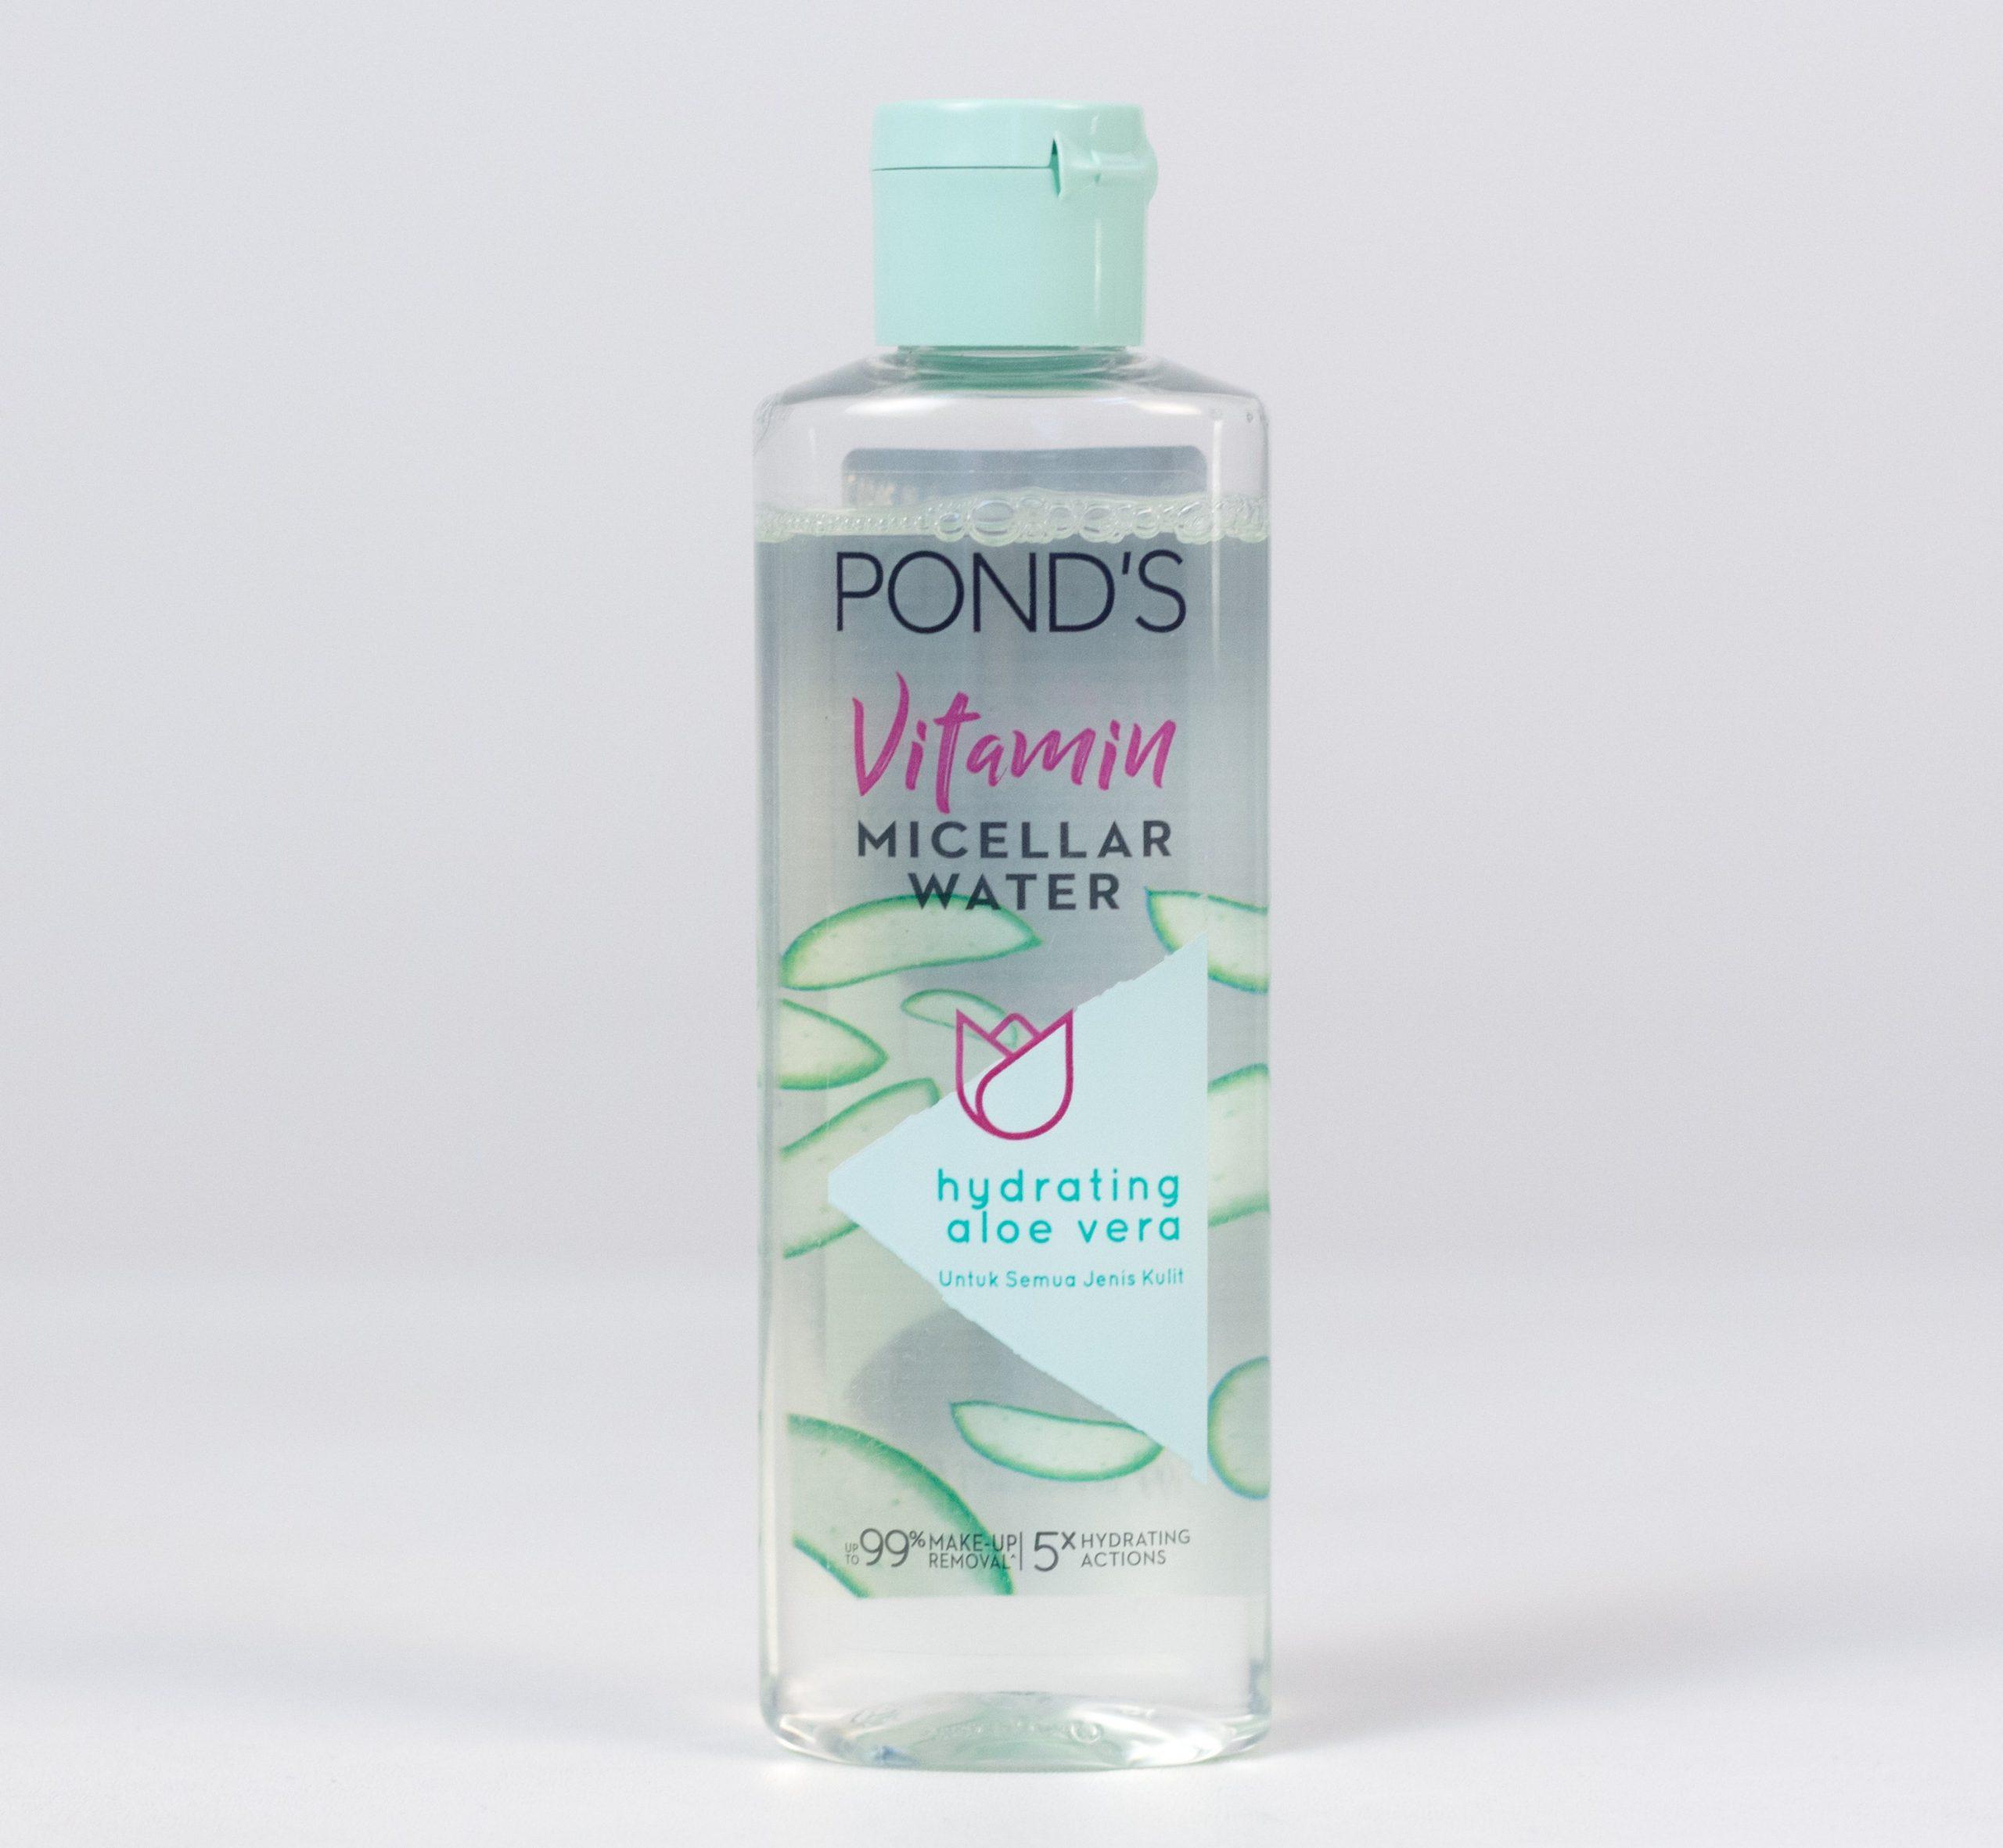 Pond's Vitamin Micellar Water Hydrating Aloe Vera